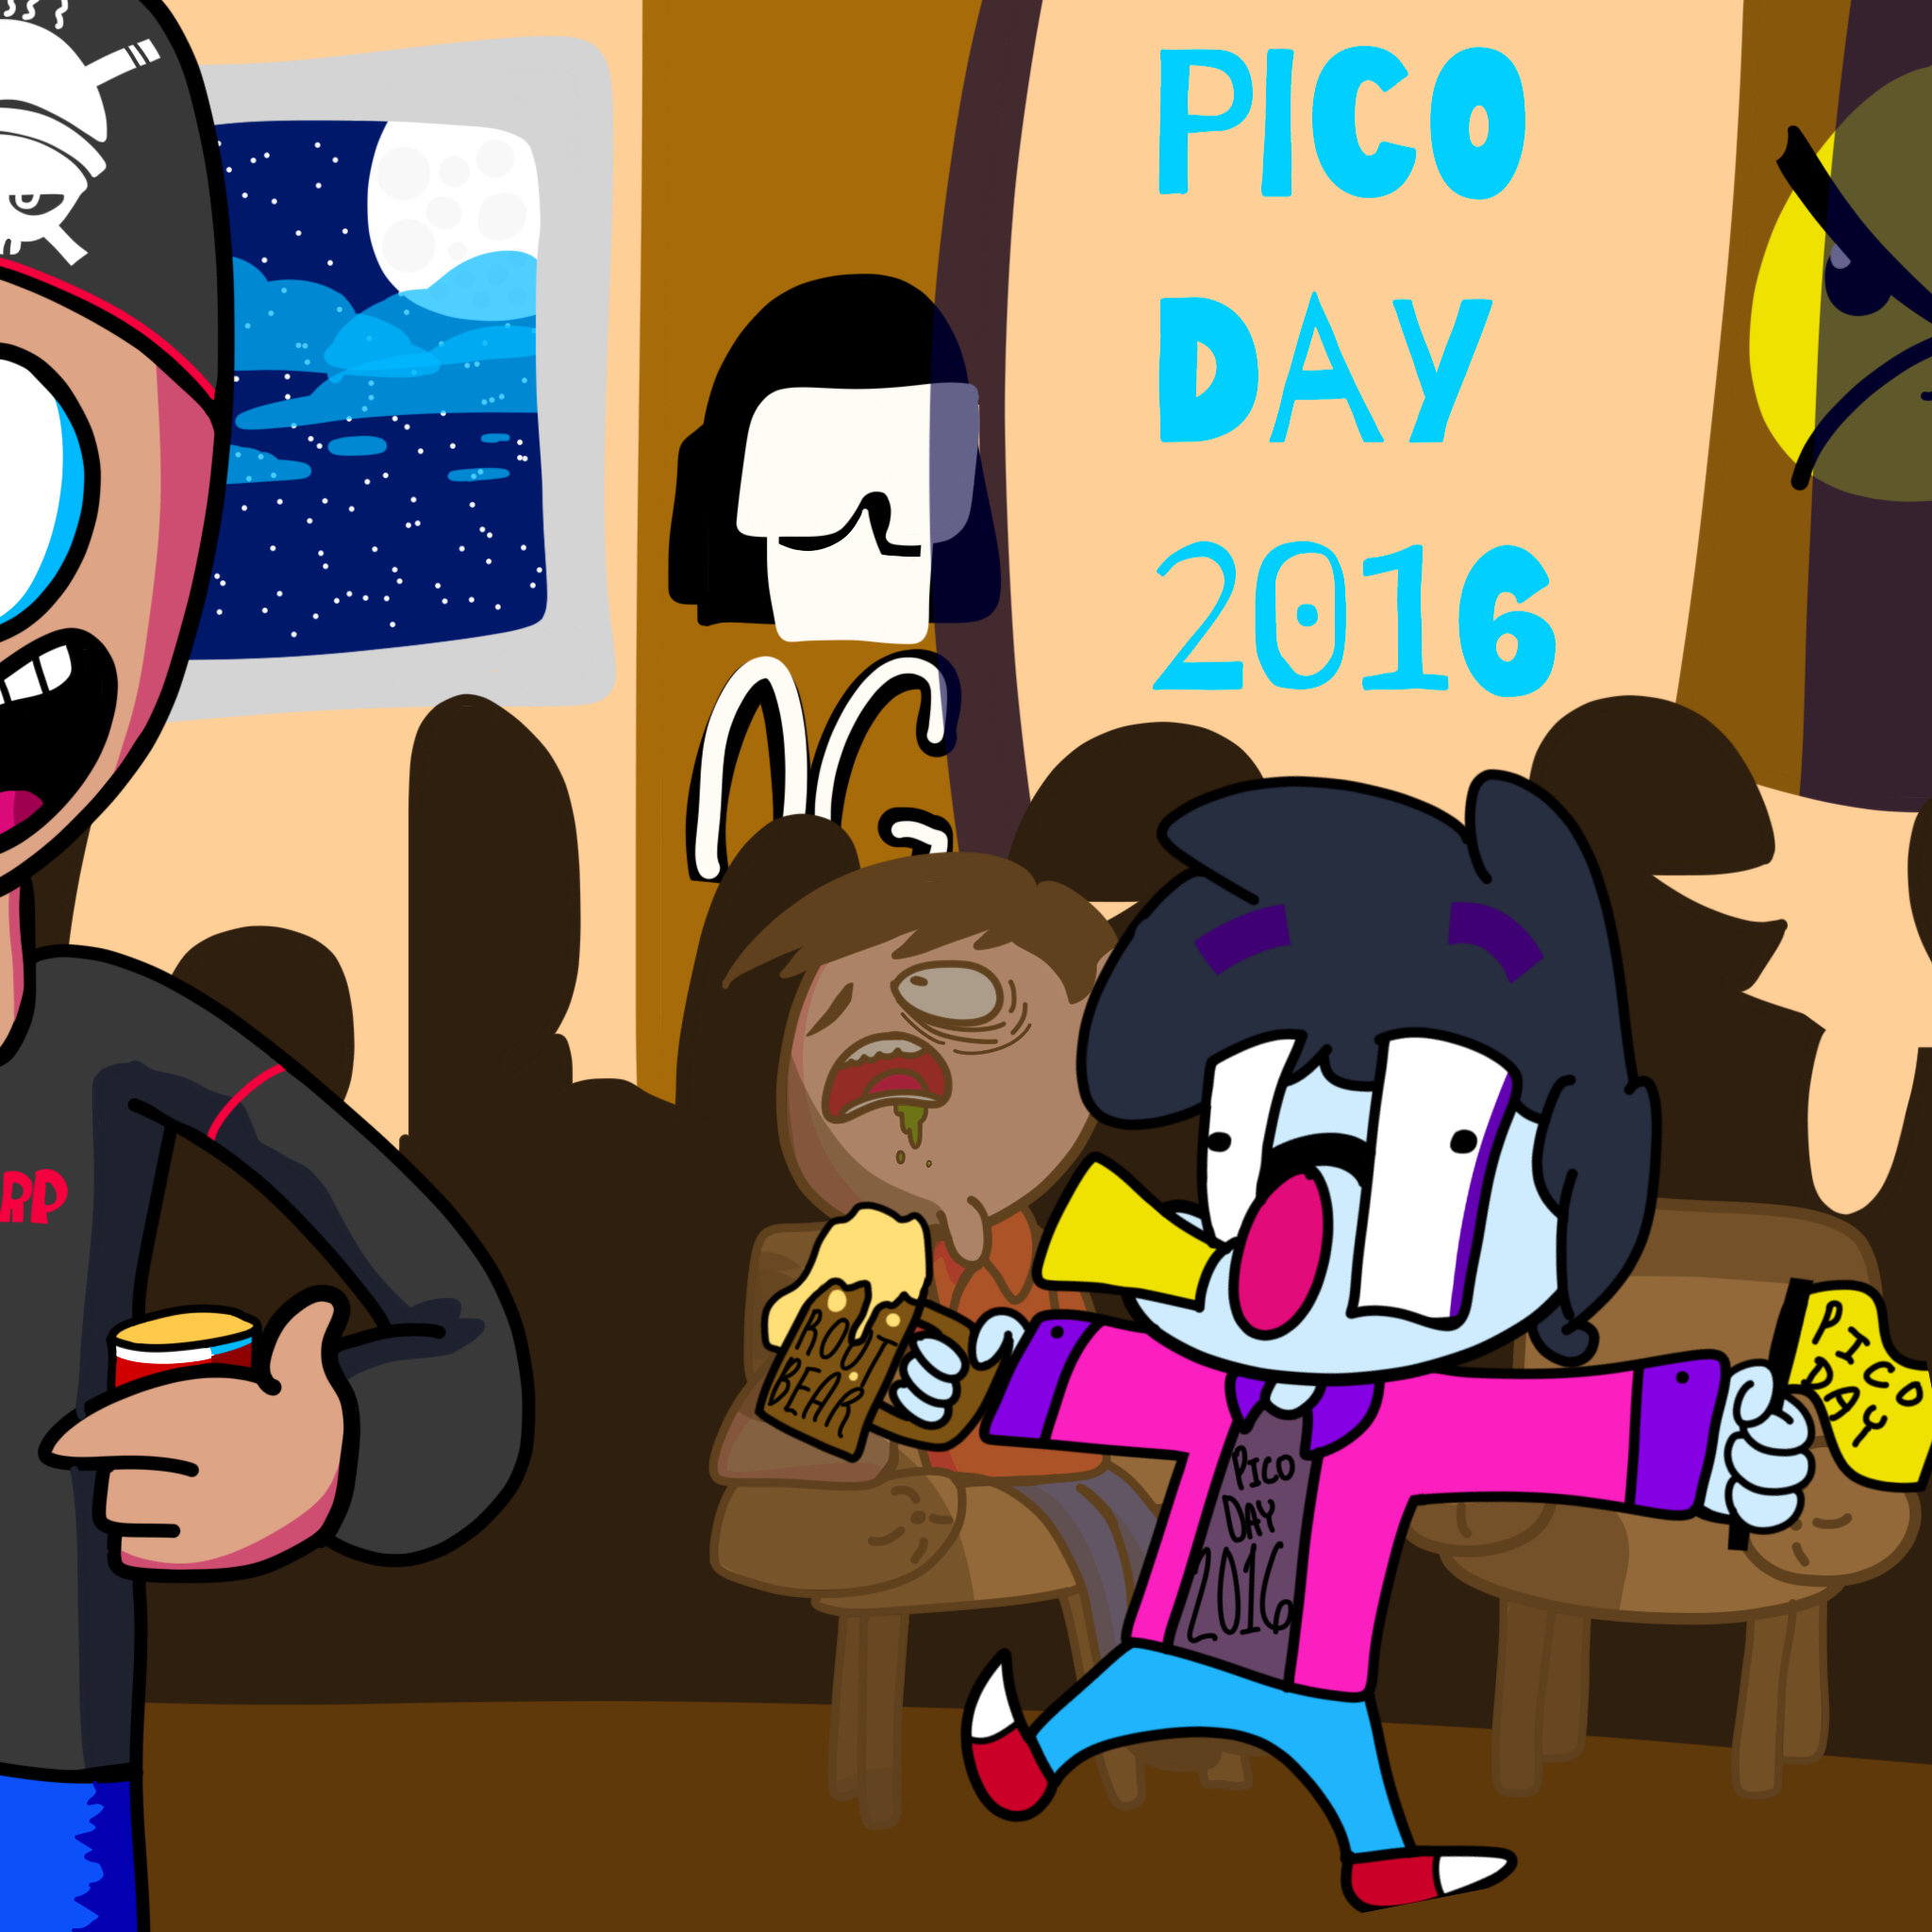 PicoDay2016